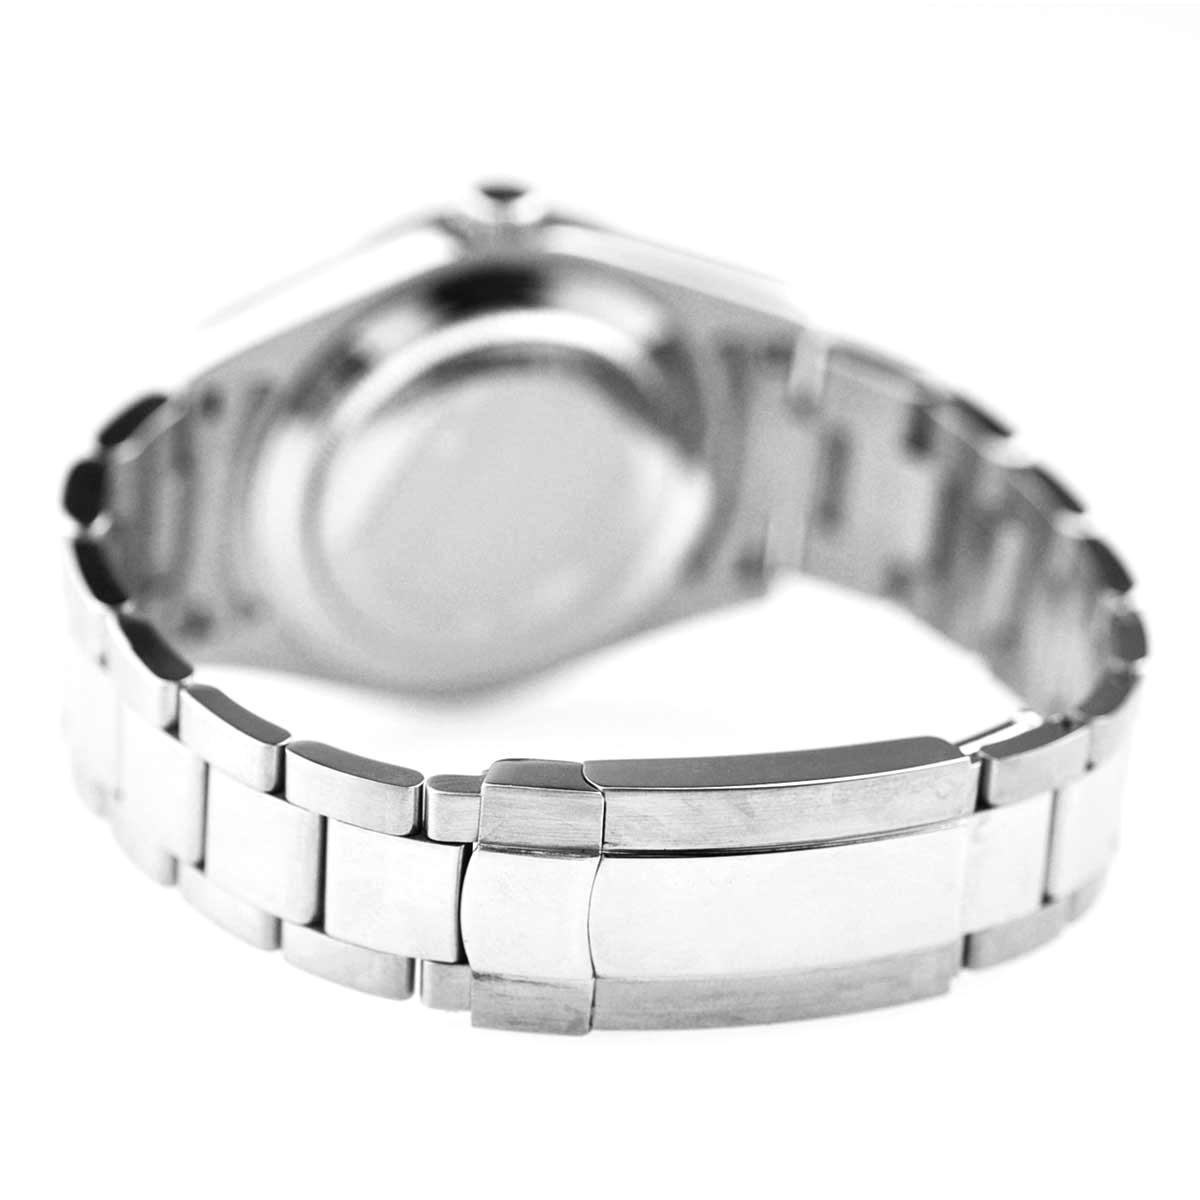 NOLOGO ノーロゴ 機械式腕時計 自動巻 オートマチック デイトジャスト DATE JUST 日付/夜光表示 [ NL-045SW3ASR ] シンプル メンズ【当店保証24ヶ月】